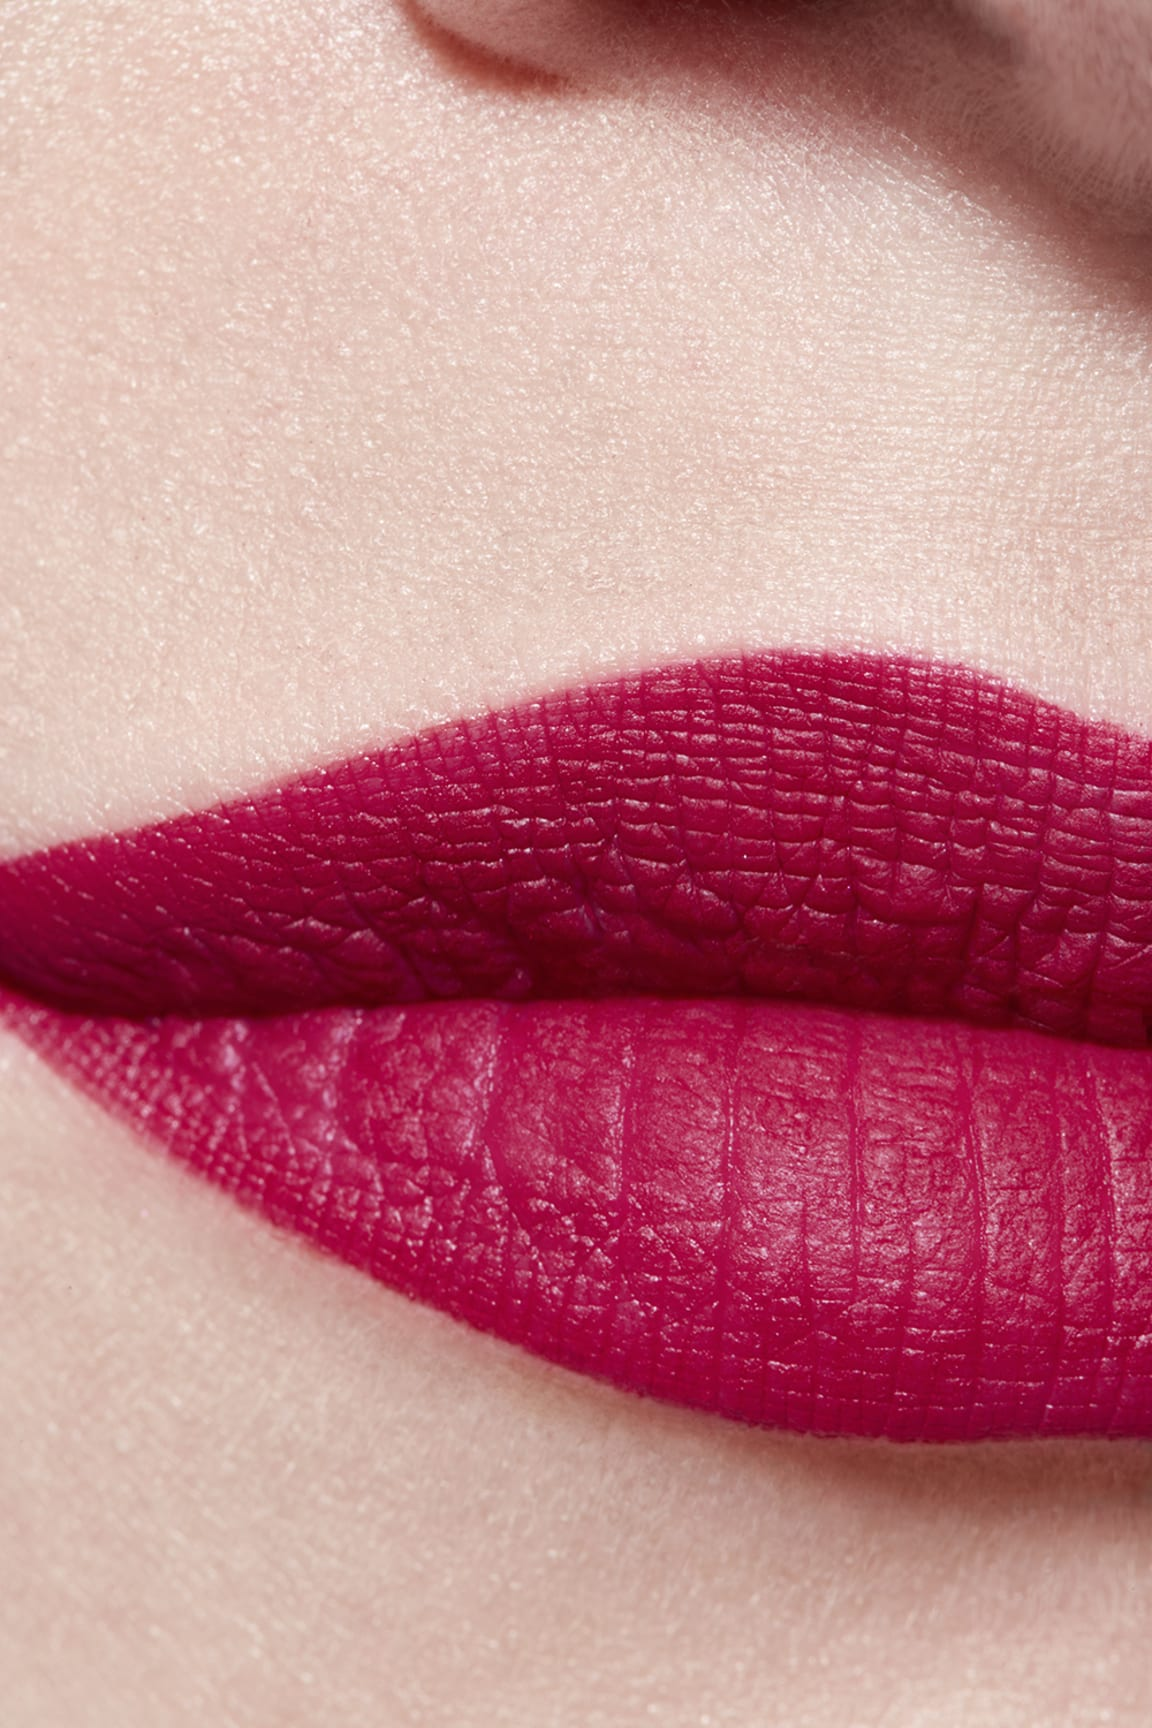 Application makeup visual 3 - ROUGE ALLURE VELVET 38 - LA FASCINANTE